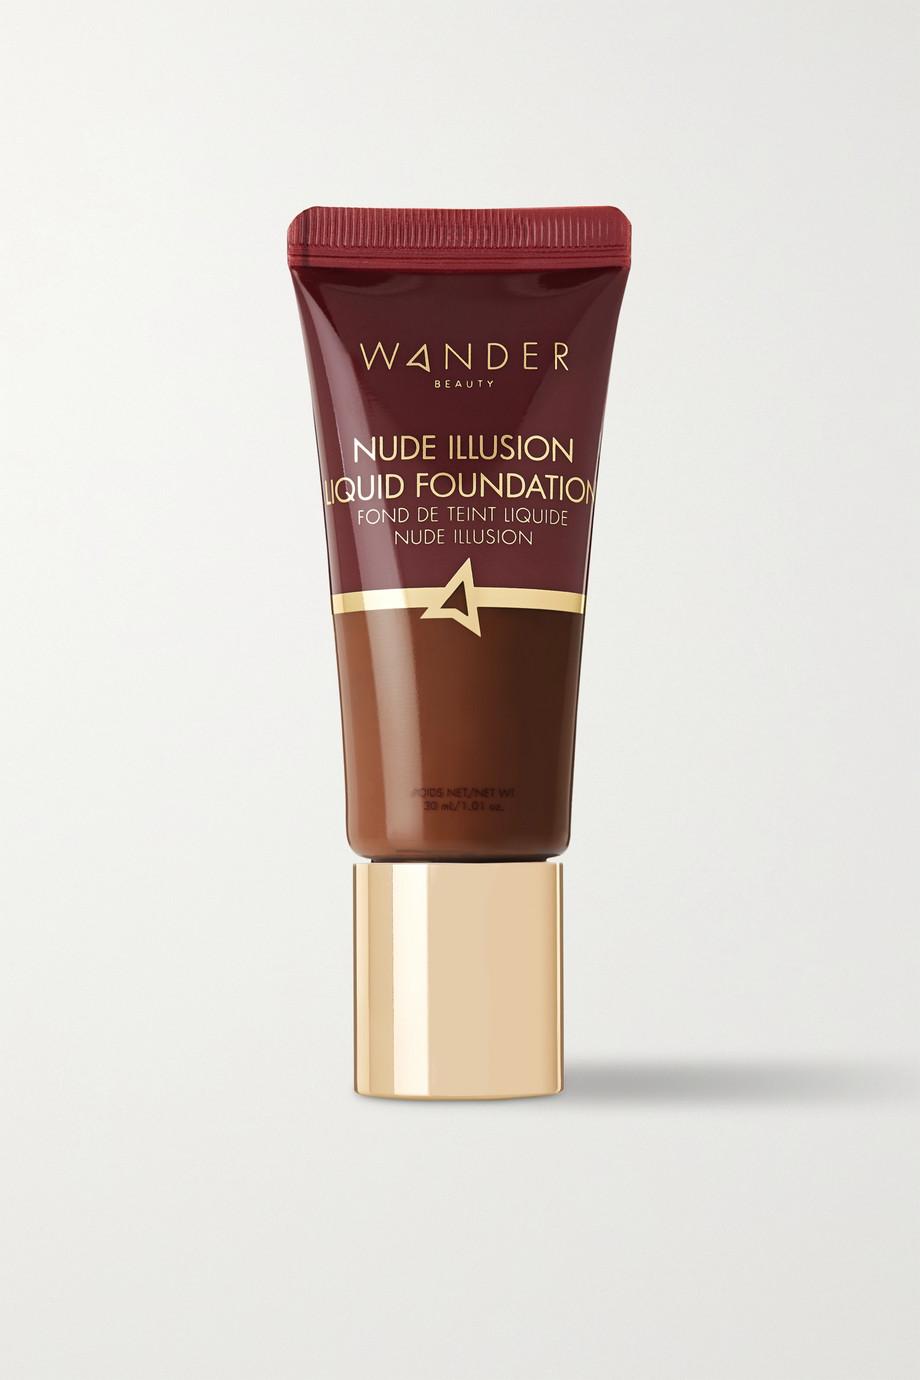 Wander Beauty Nude Illusion Liquid Foundation – Deep – Foundation